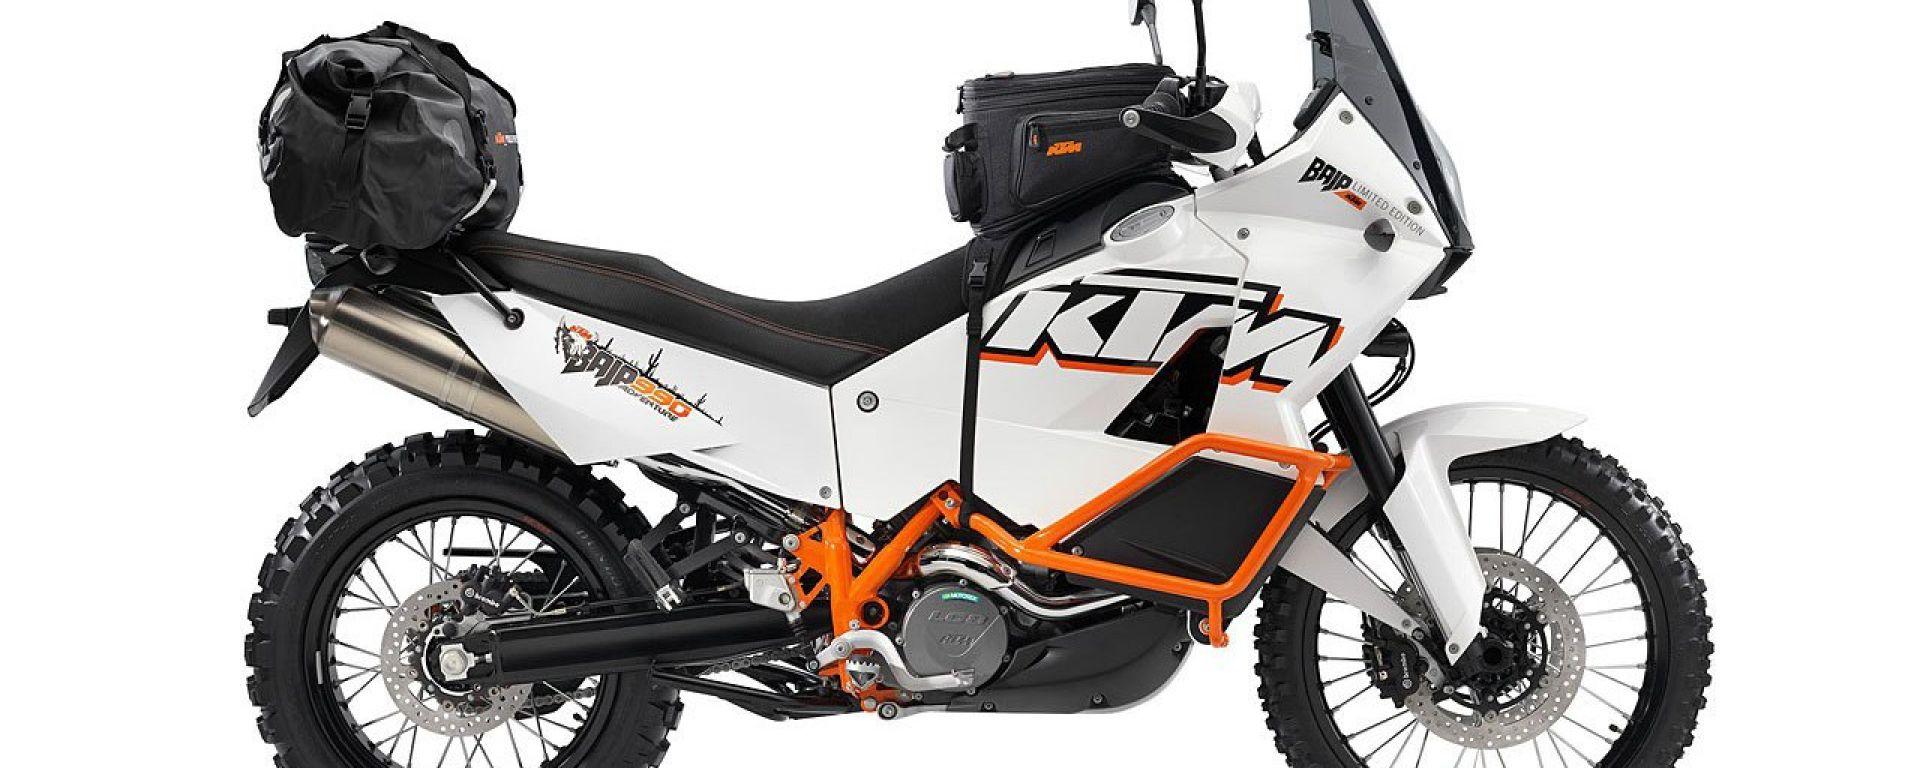 KTM 990 Adventure Baja